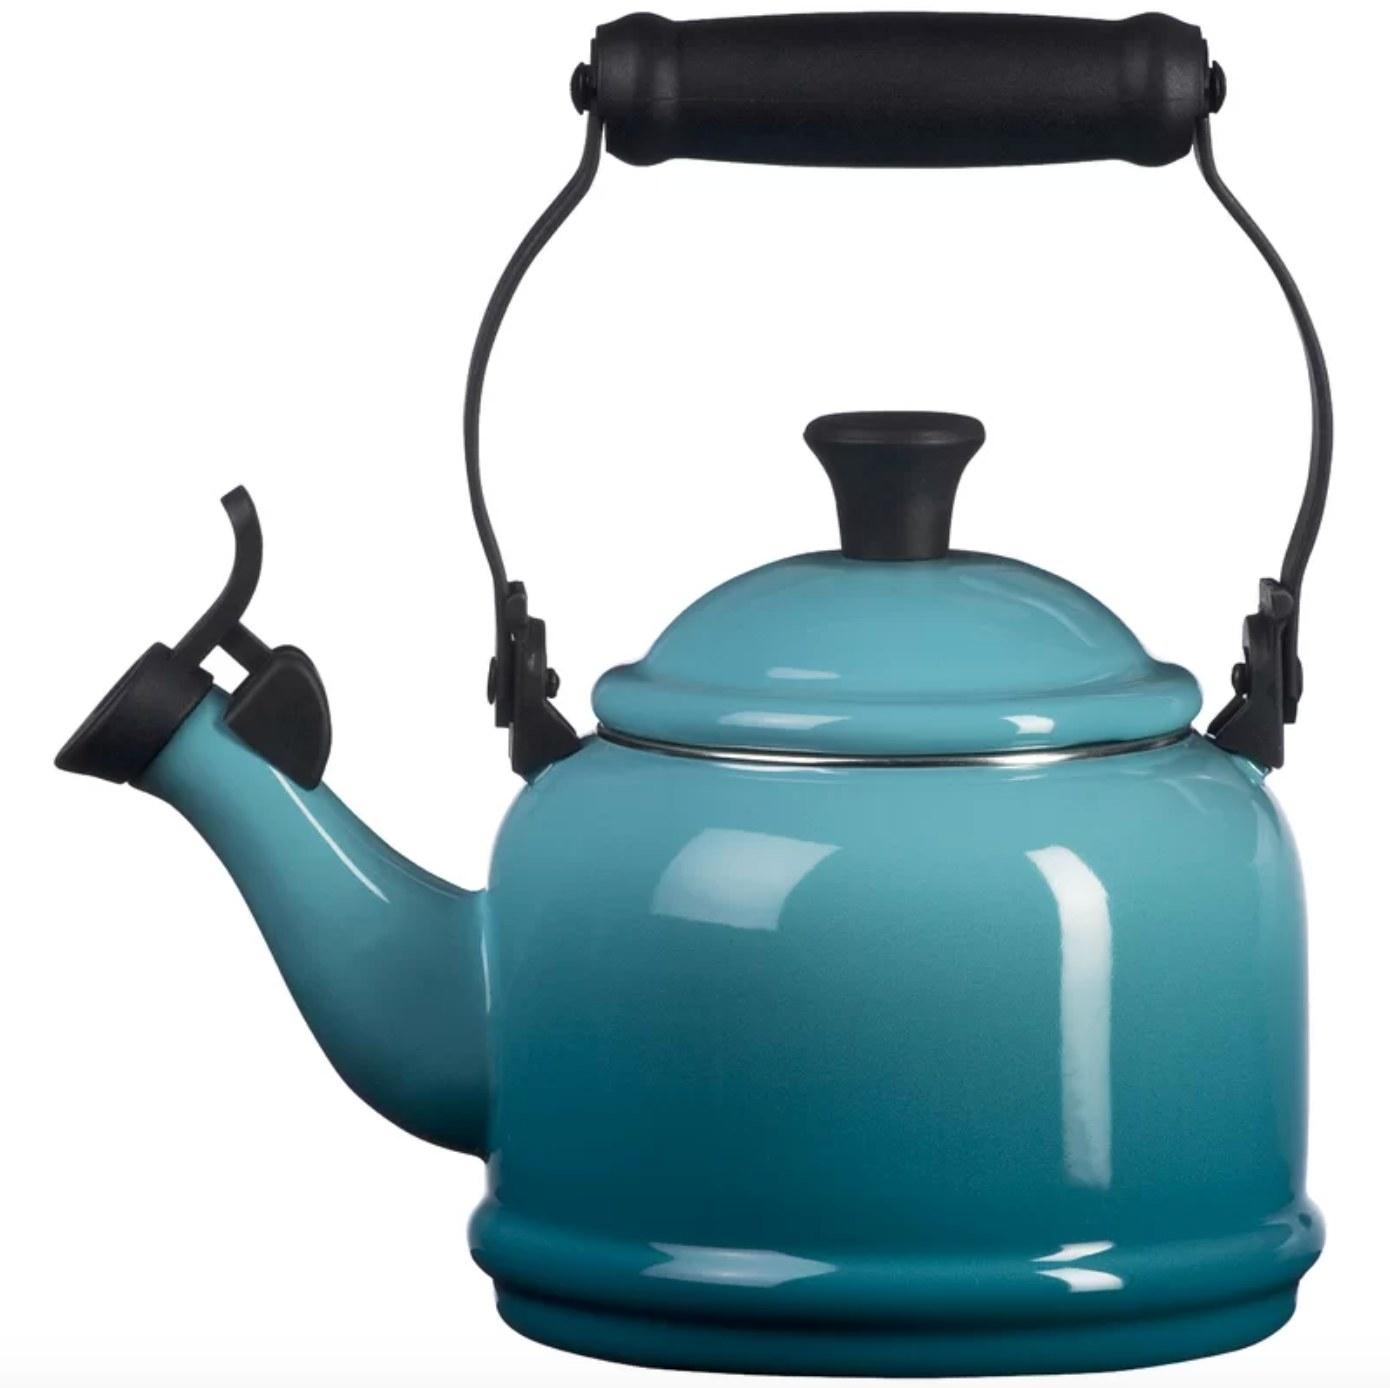 The Le Creuset enamel tea kettle in carribean